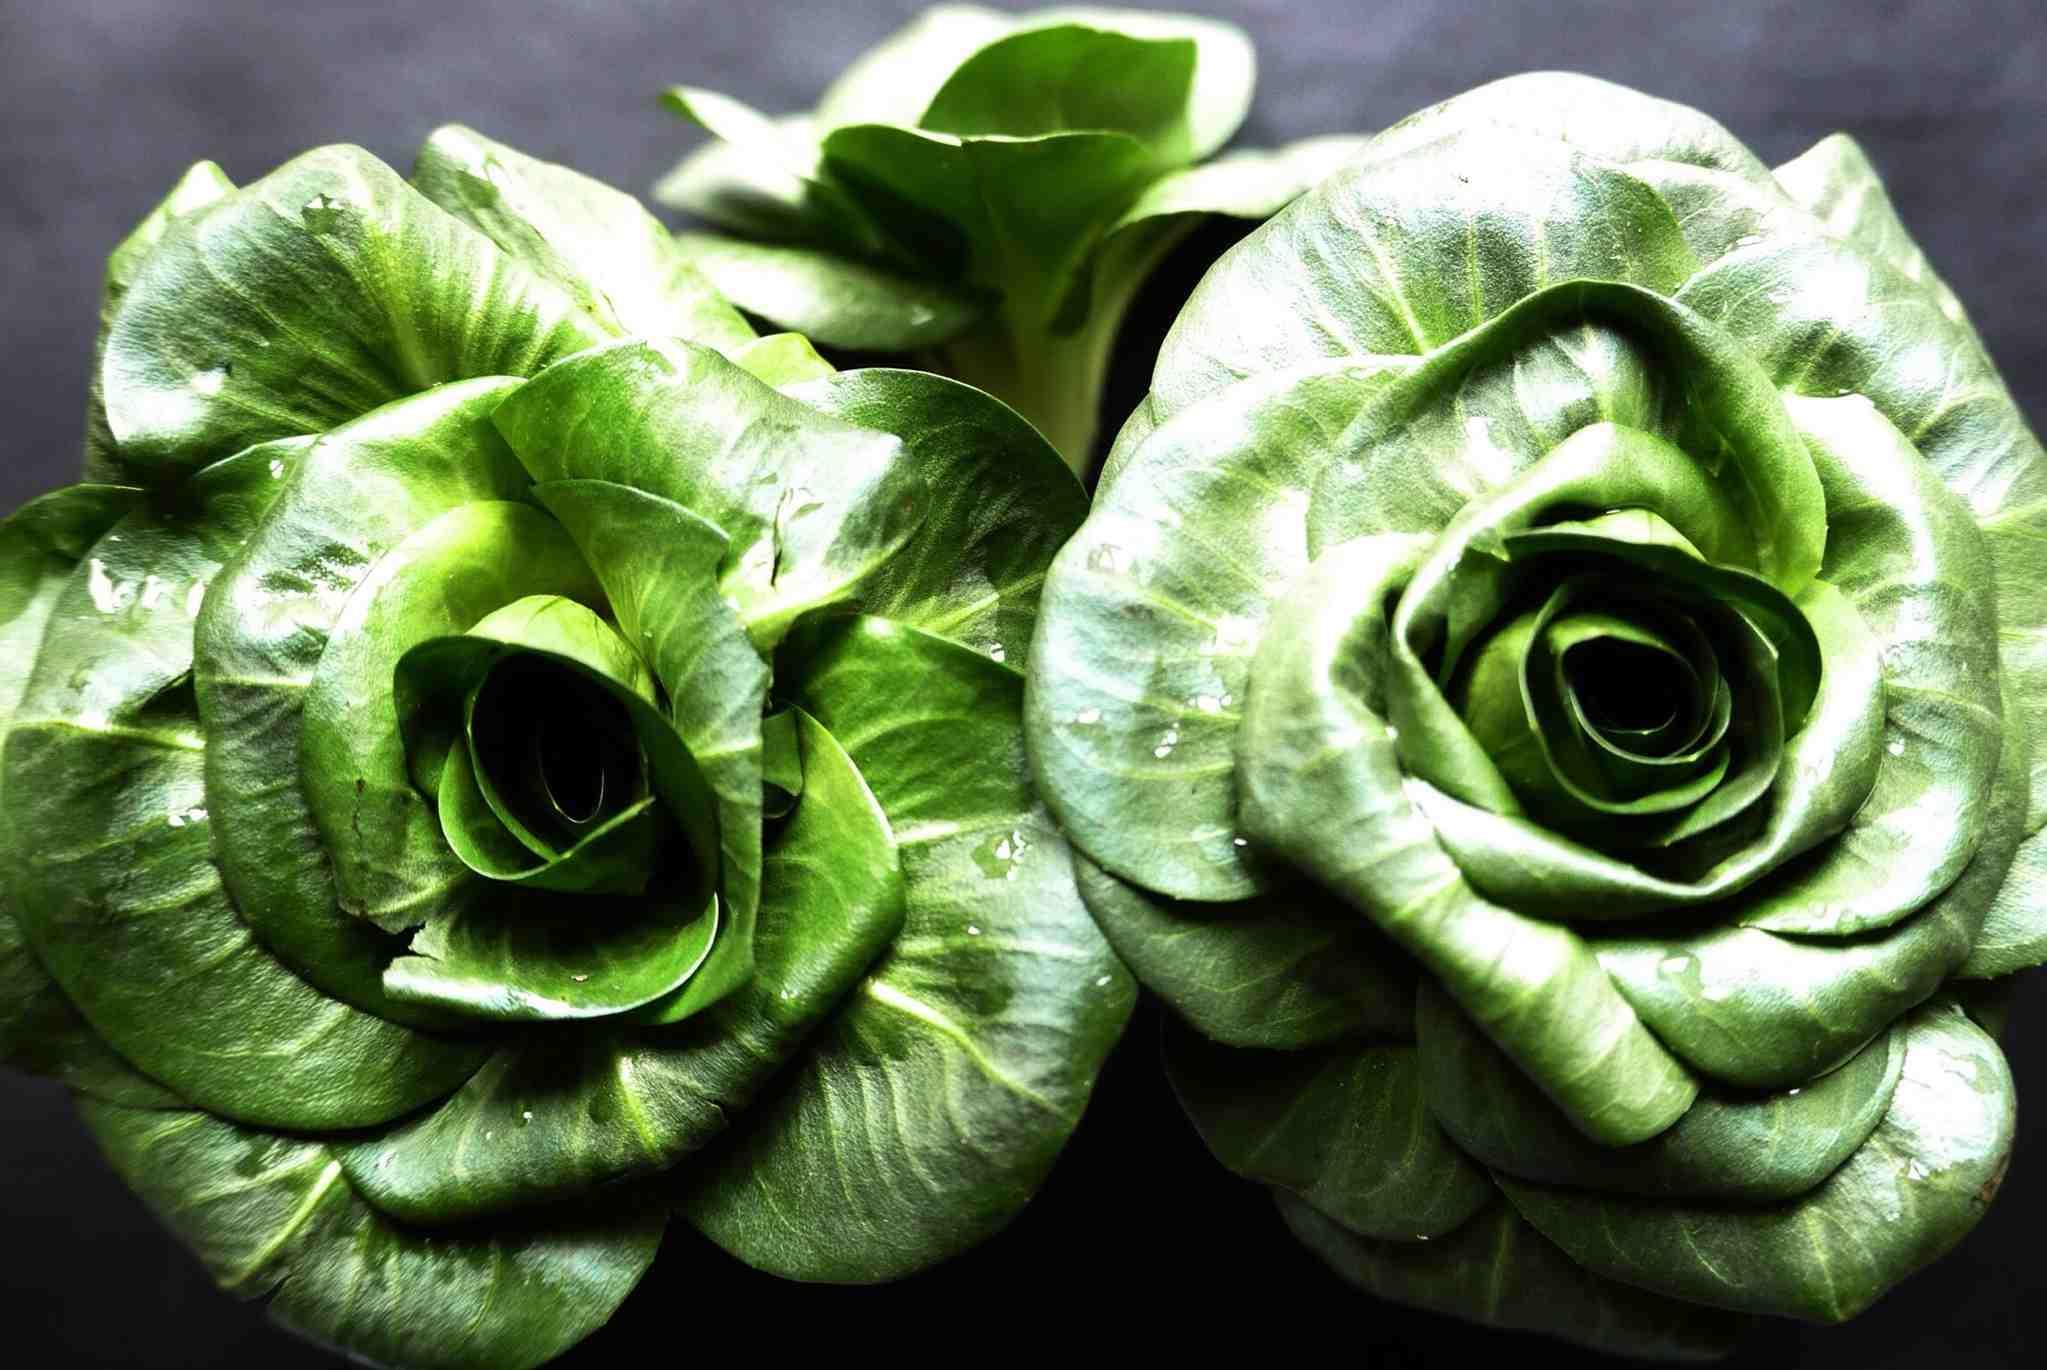 Green Escarole (Endive)